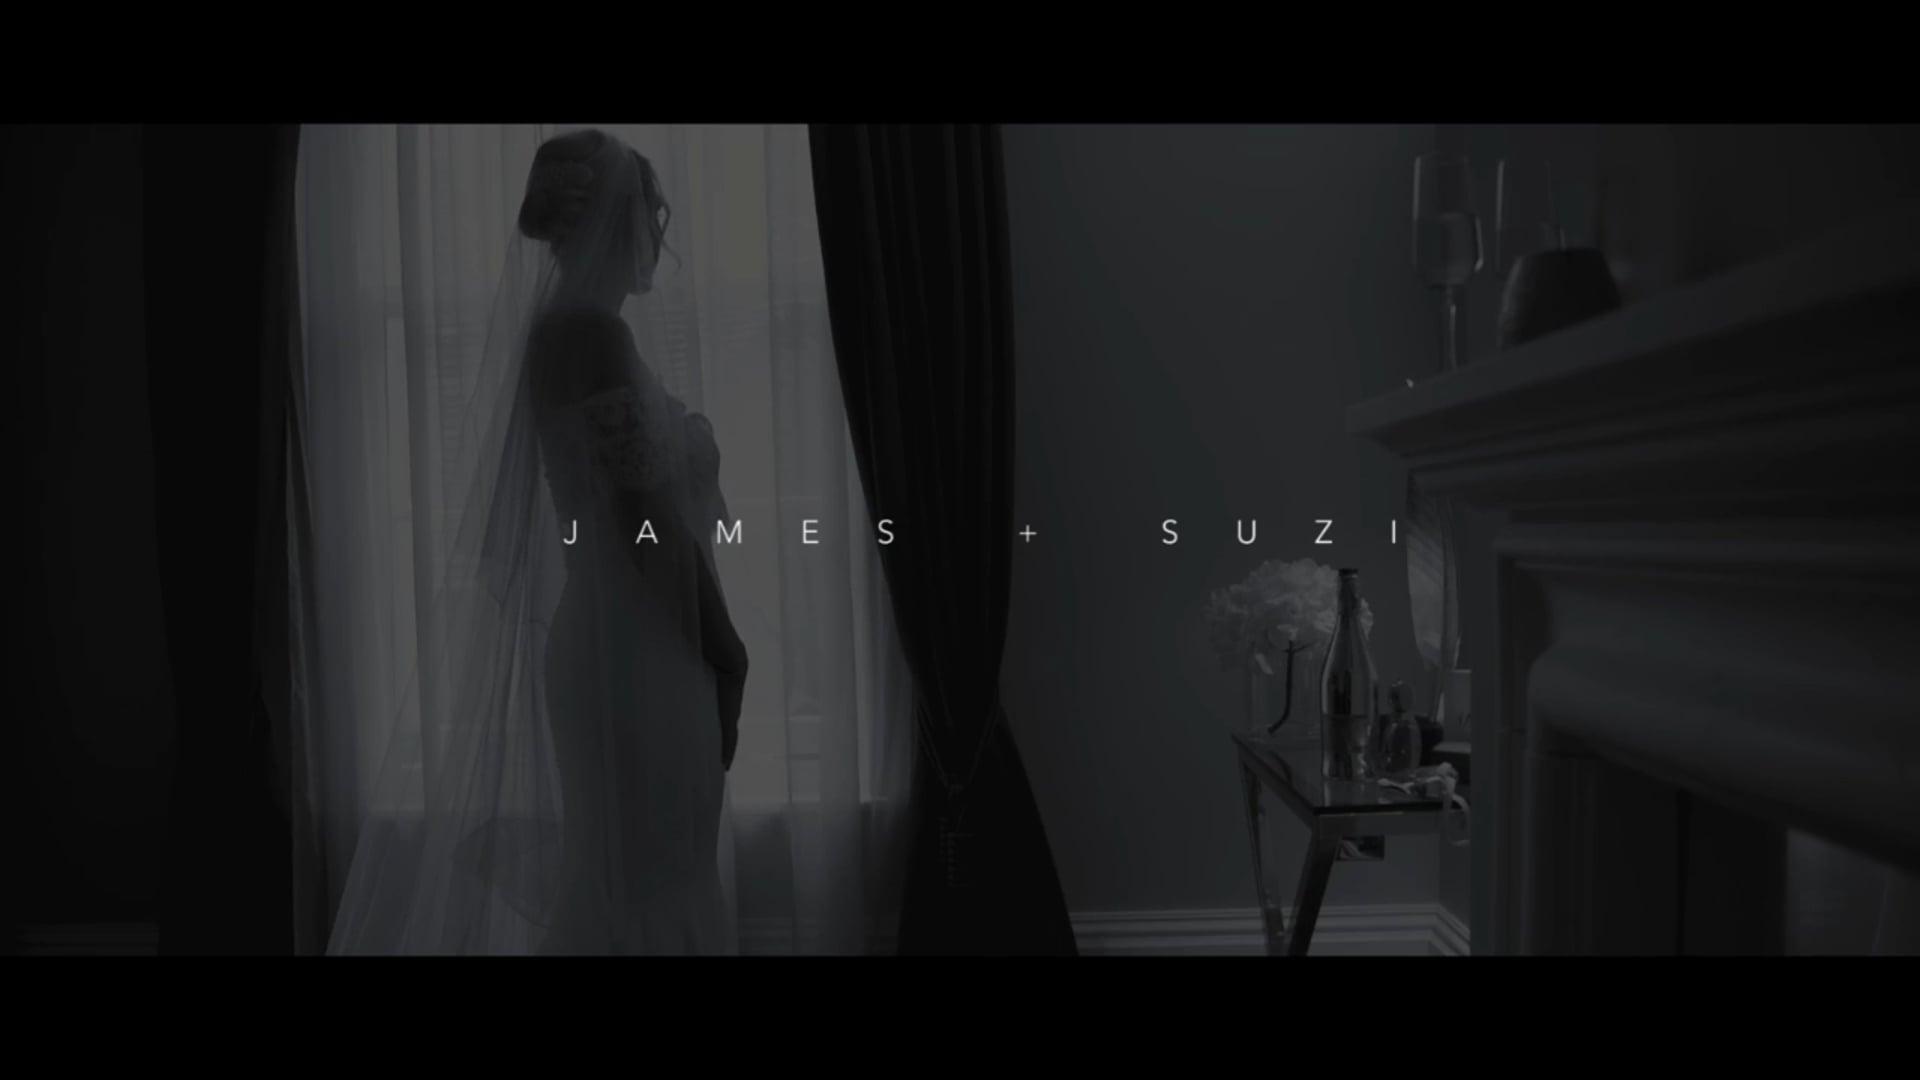 James + Suzi